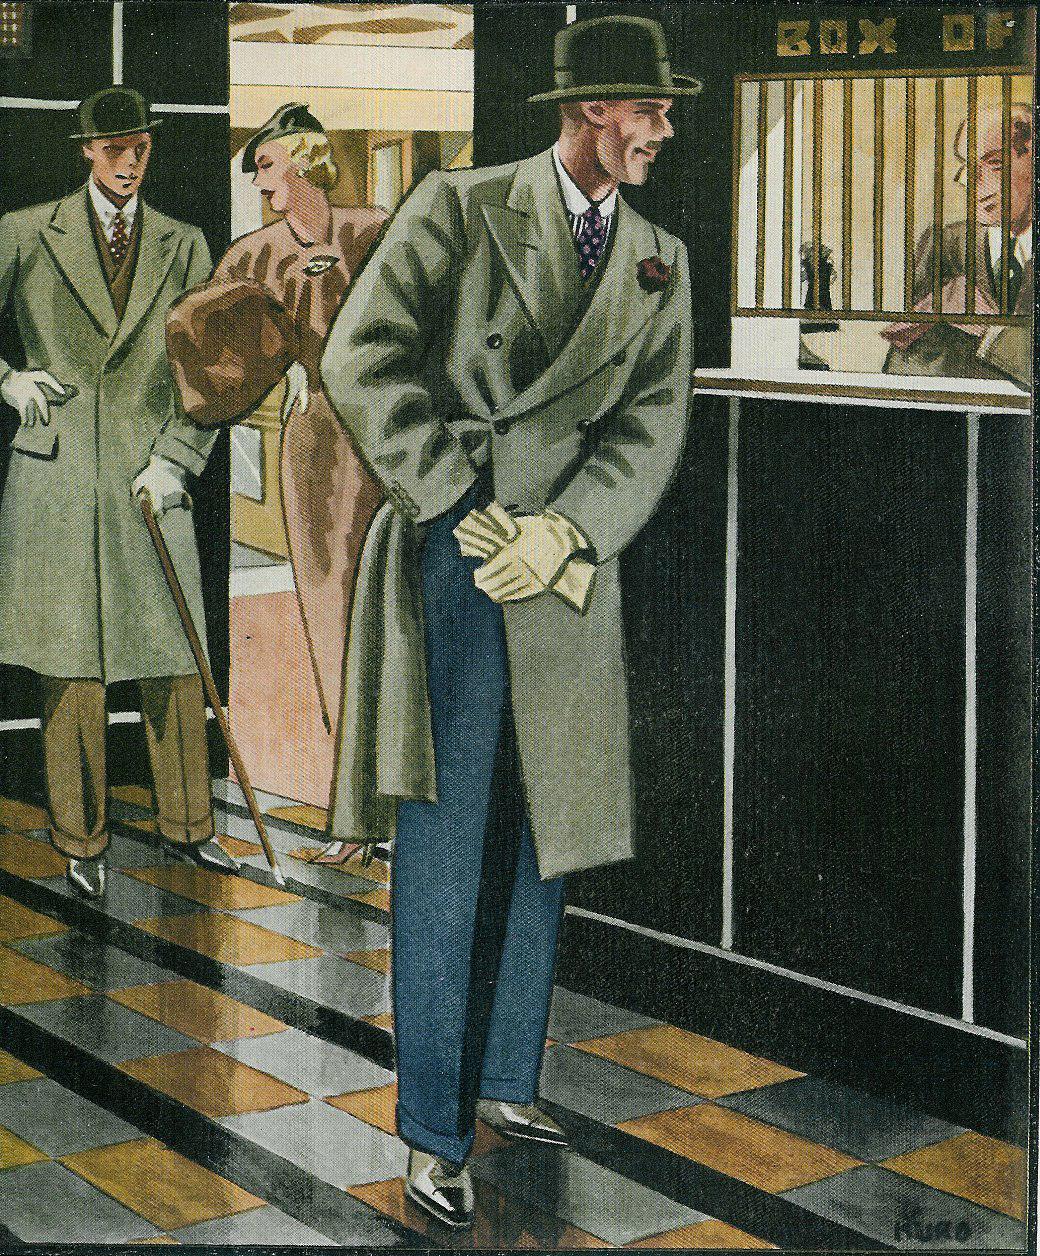 The black Homberg-- the hero swipes the villain's hat. --Esquire magazine